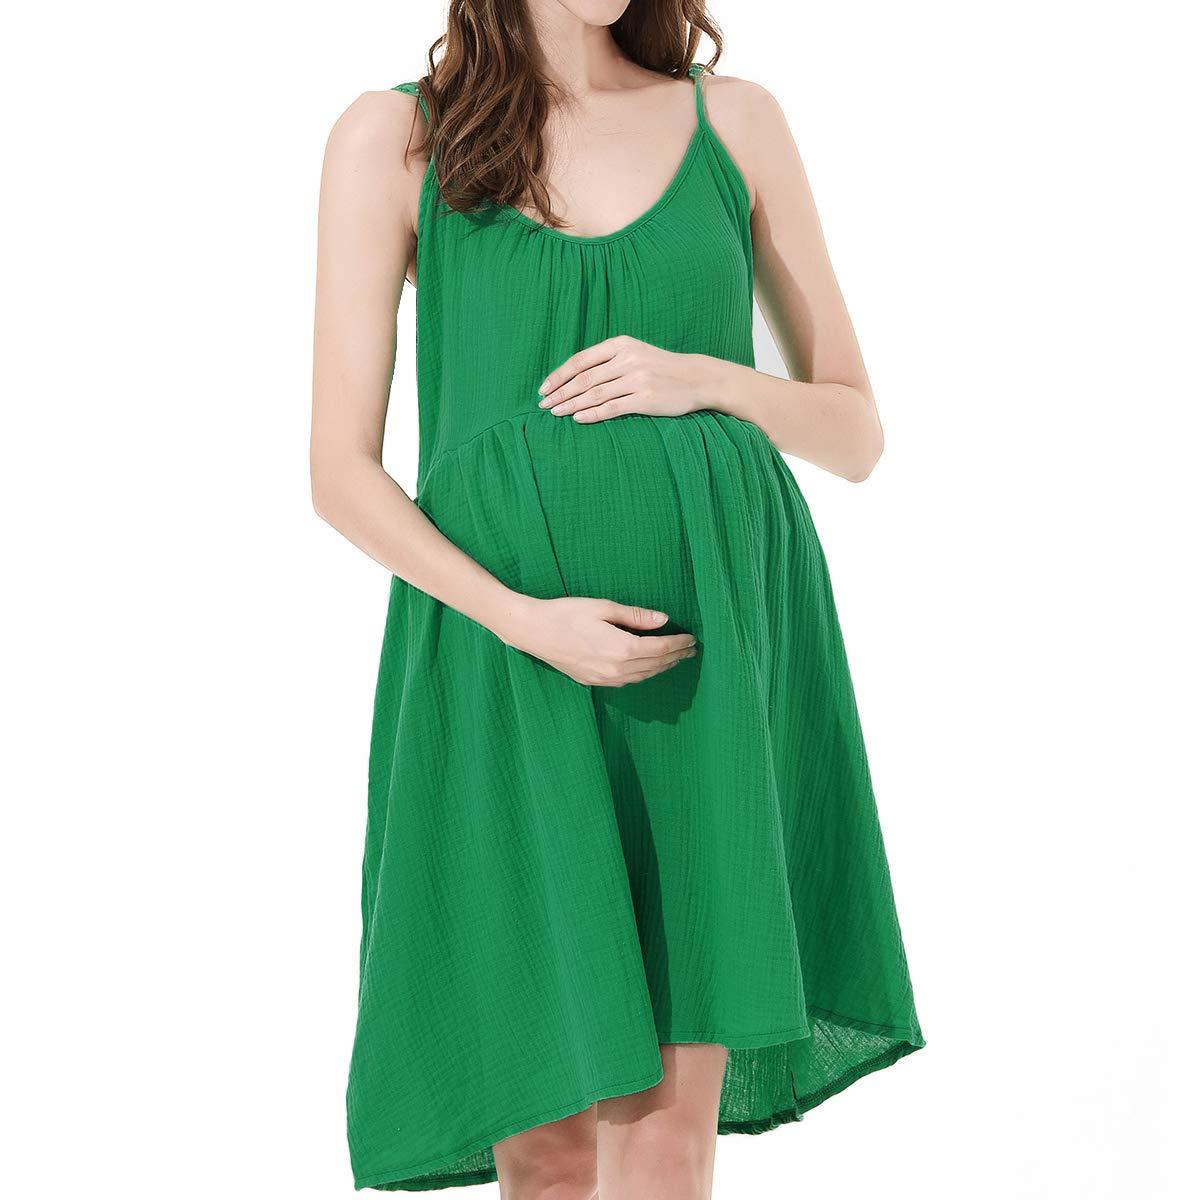 Avv Cute Dress, Women's Summer Sleeveless Nursing Dresses Flared Swing Maternity Breastfeeding Dress (Large, Green) by Avv (Image #1)